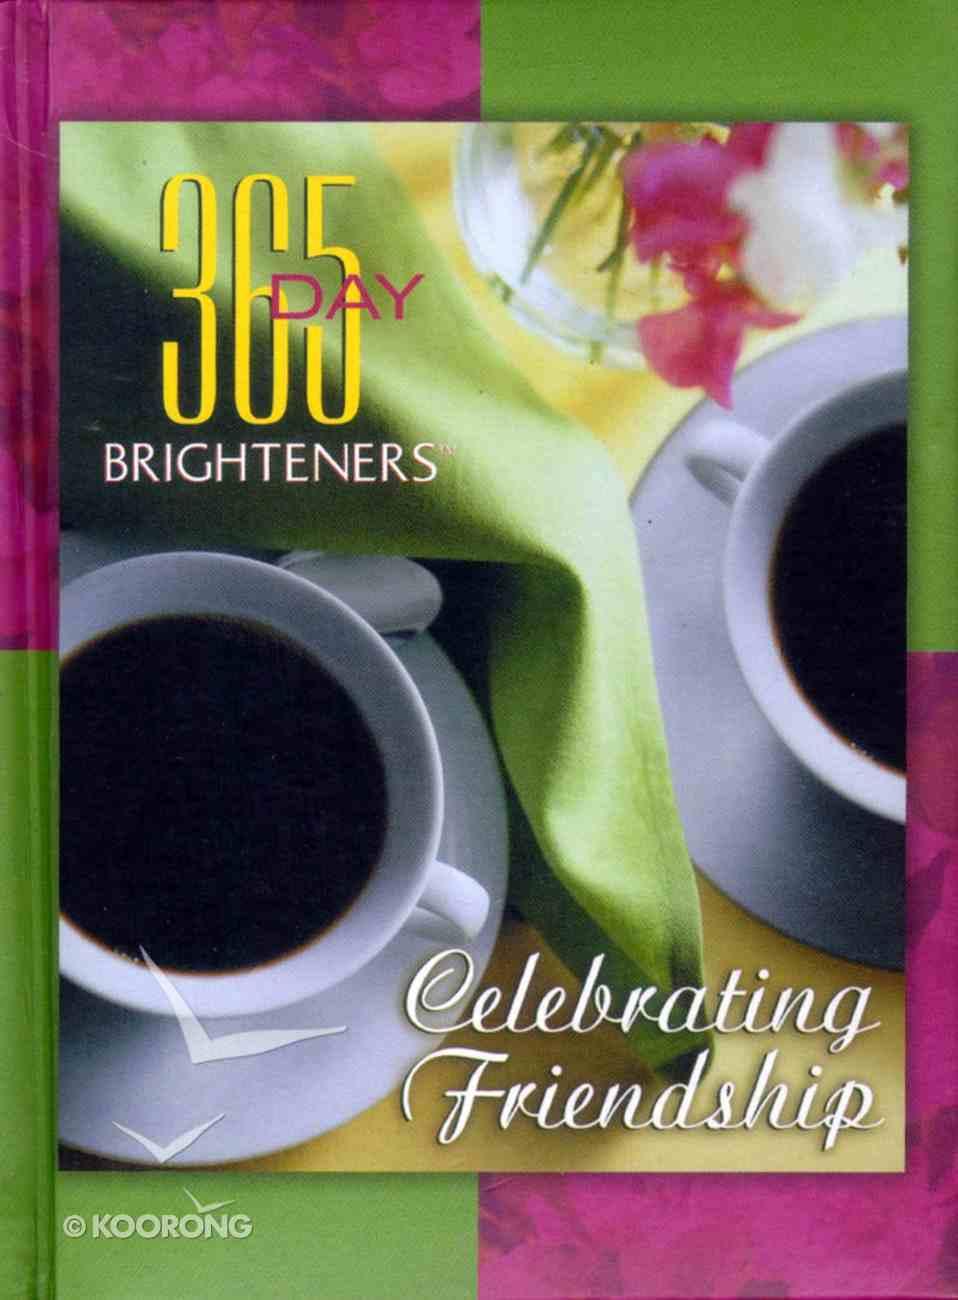 Celebrating Friendhsip (365 Day Brighteners Series) Hardback